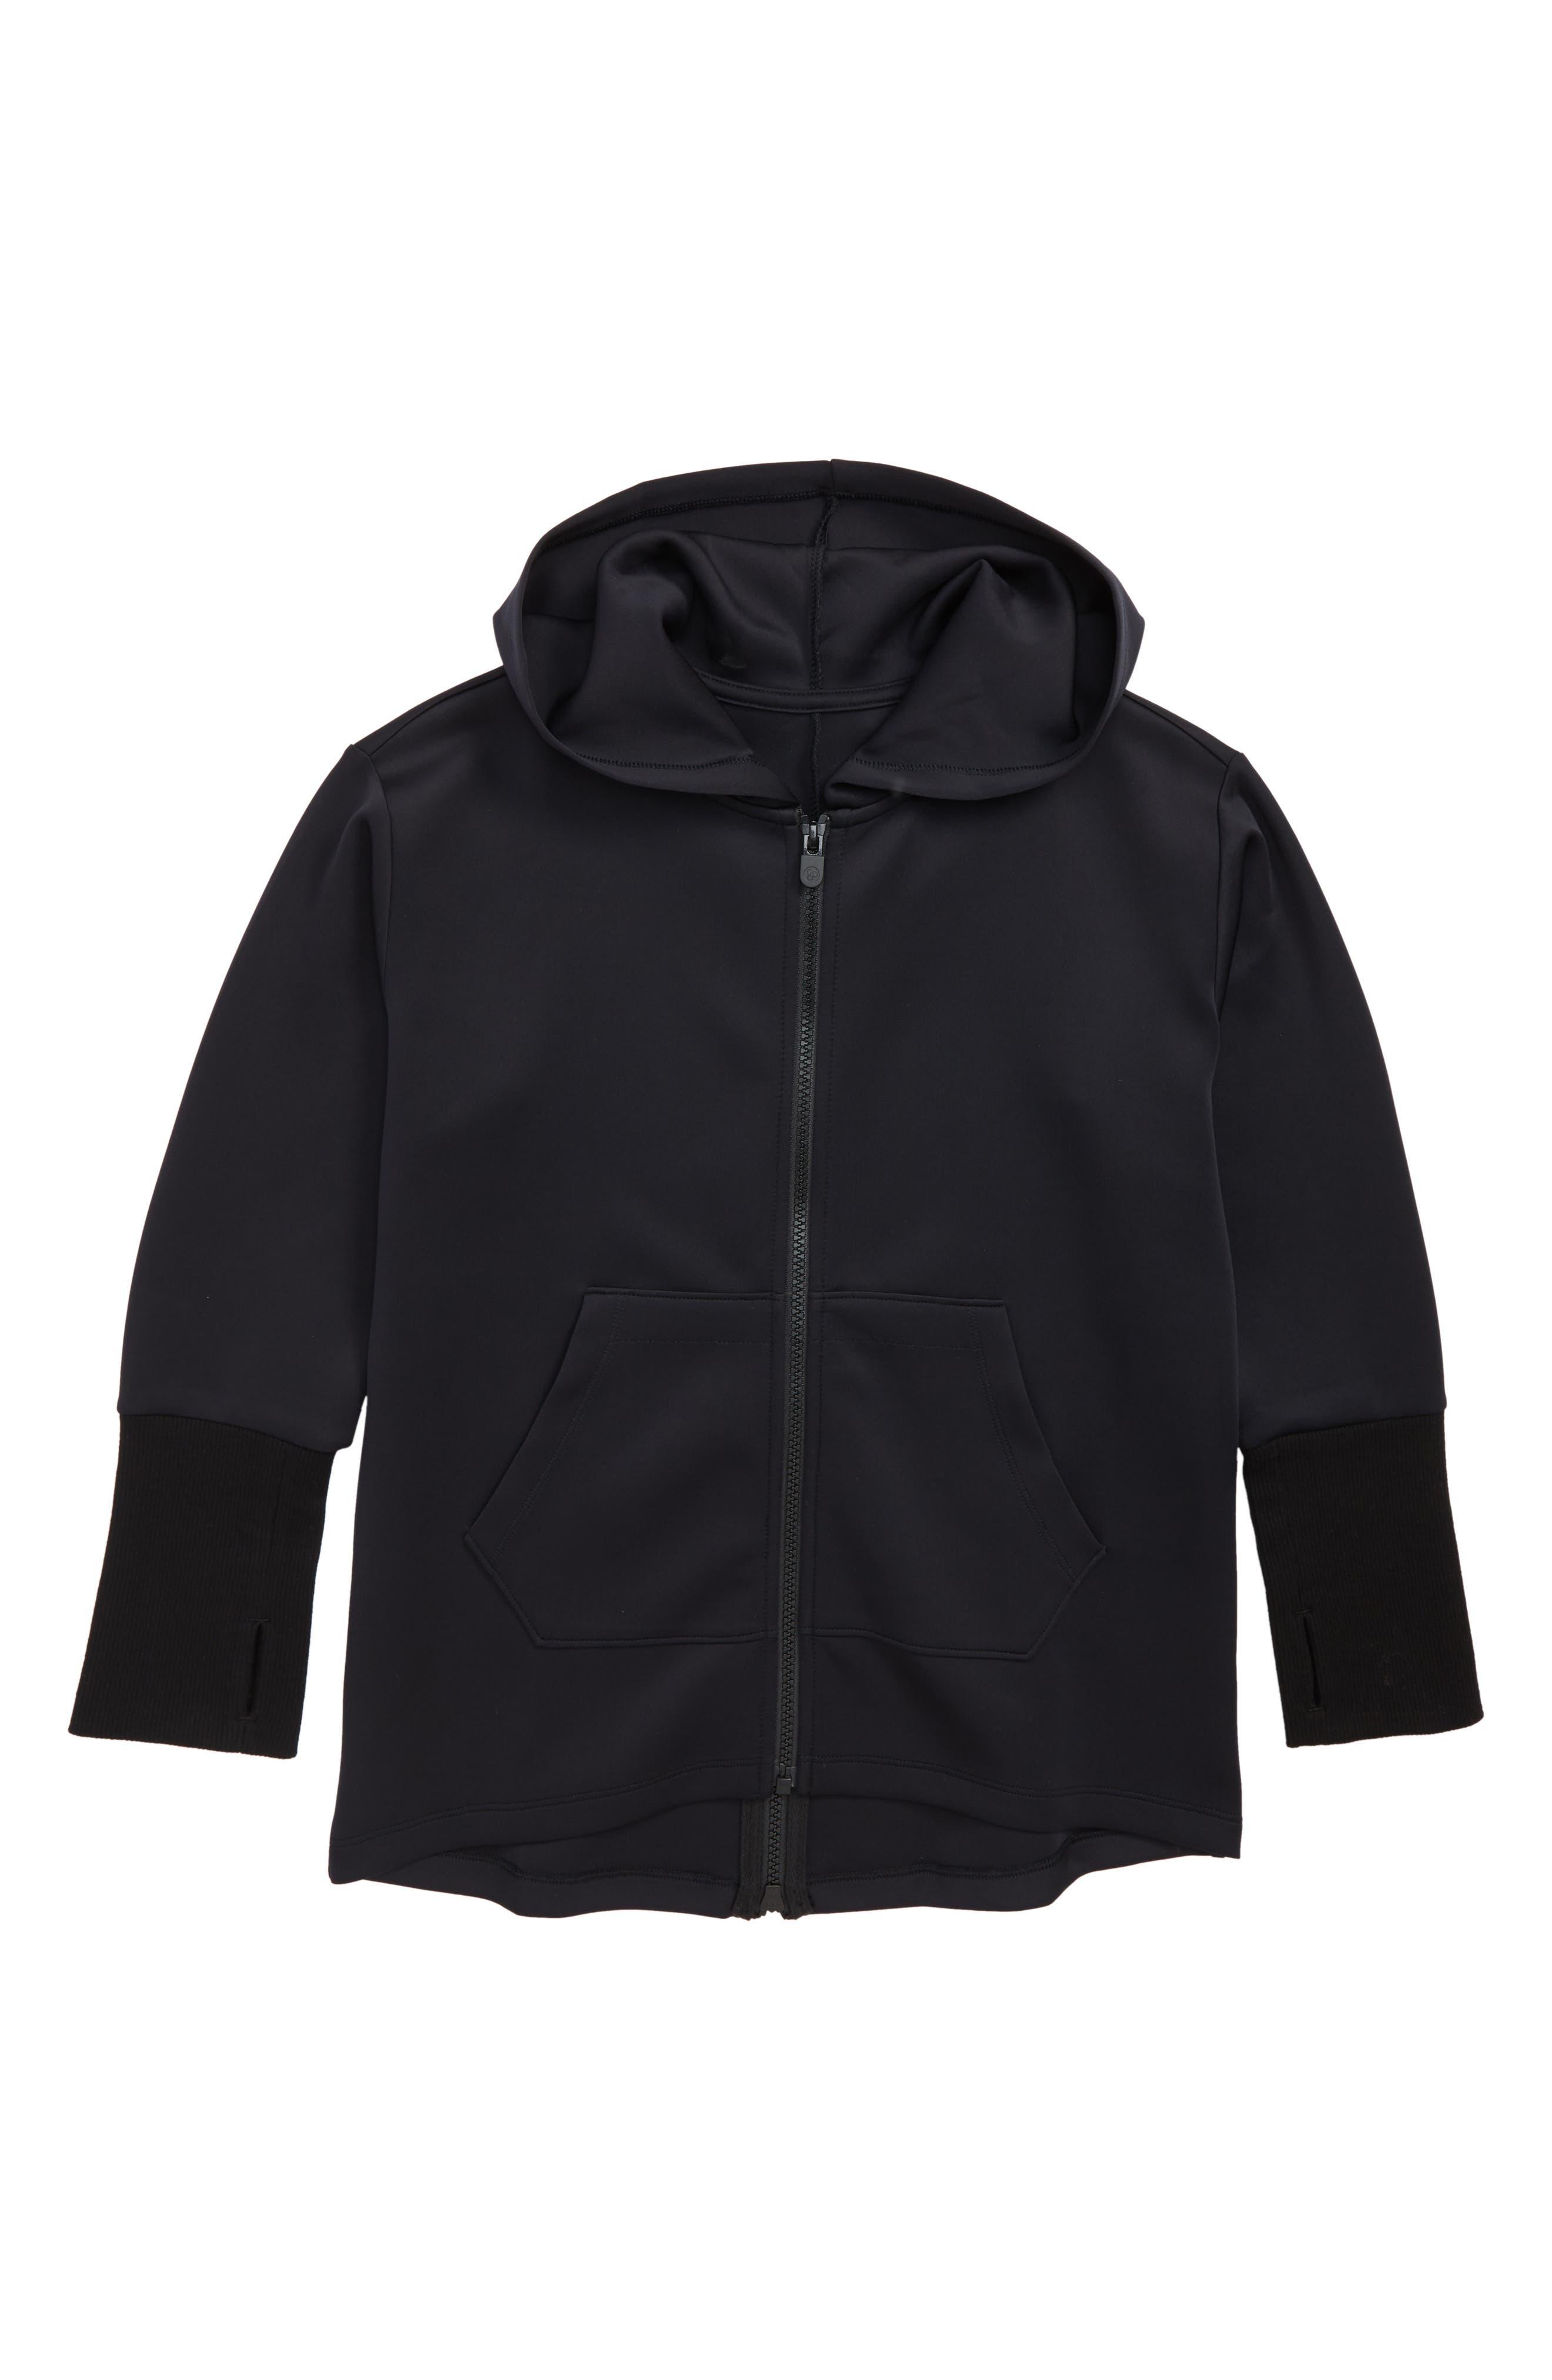 Hooded Zip Jacket,                             Main thumbnail 1, color,                             001